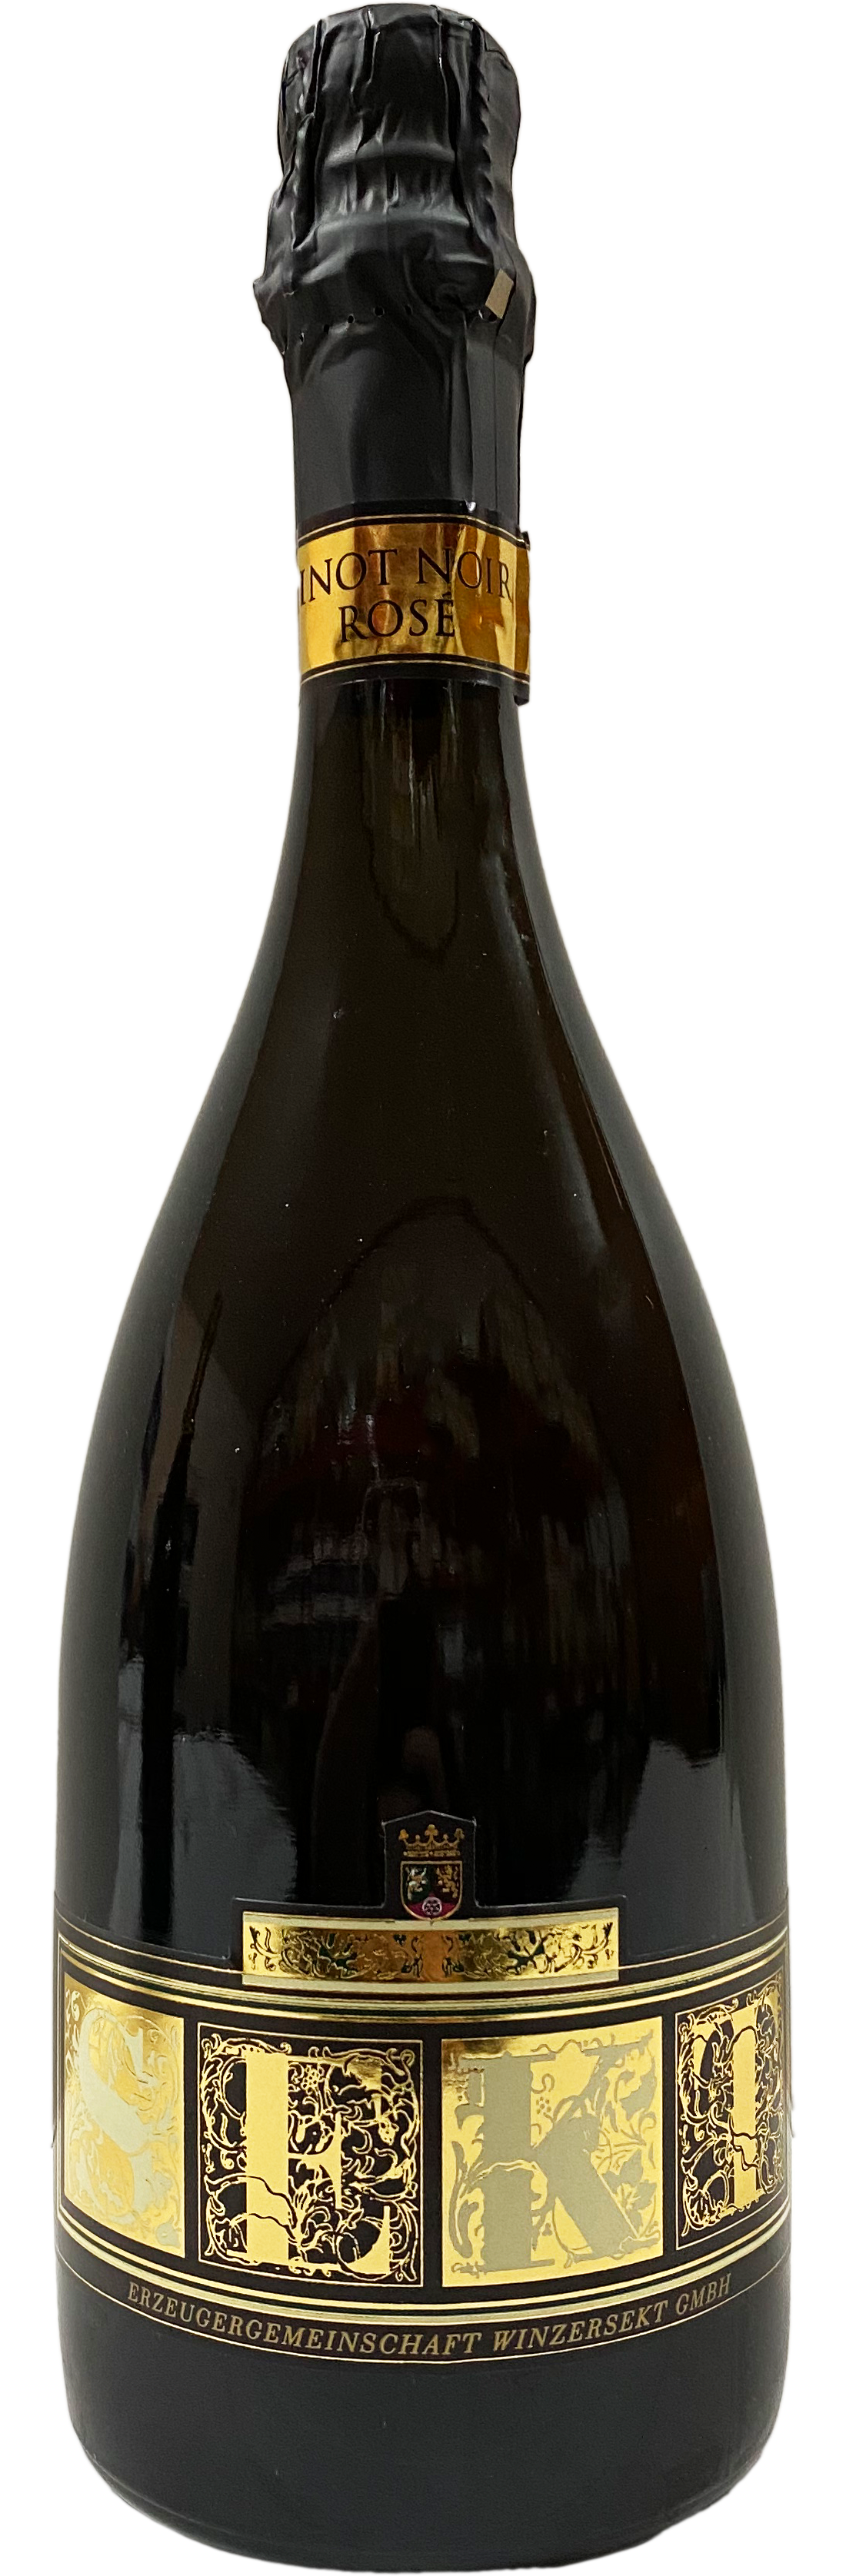 Pinot Noir Rose brut Sekt